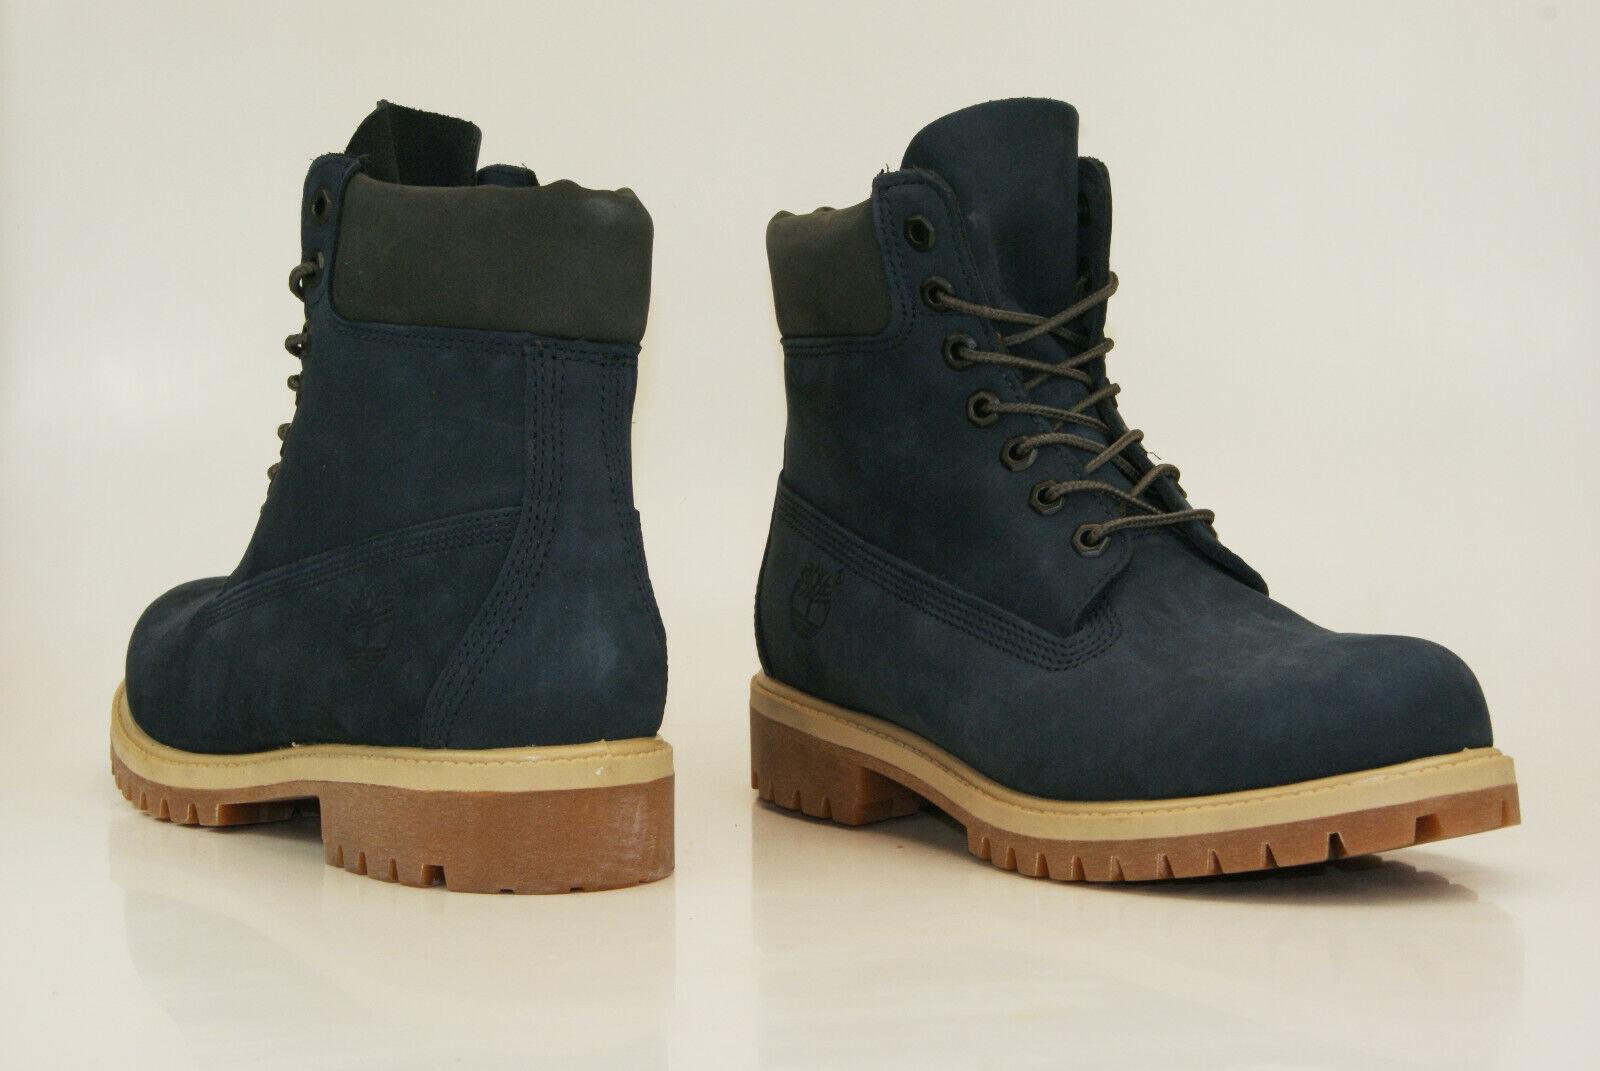 Timberland 6 inch Premium Herren BOOTS A1LYH DUNKELBLAU Gr